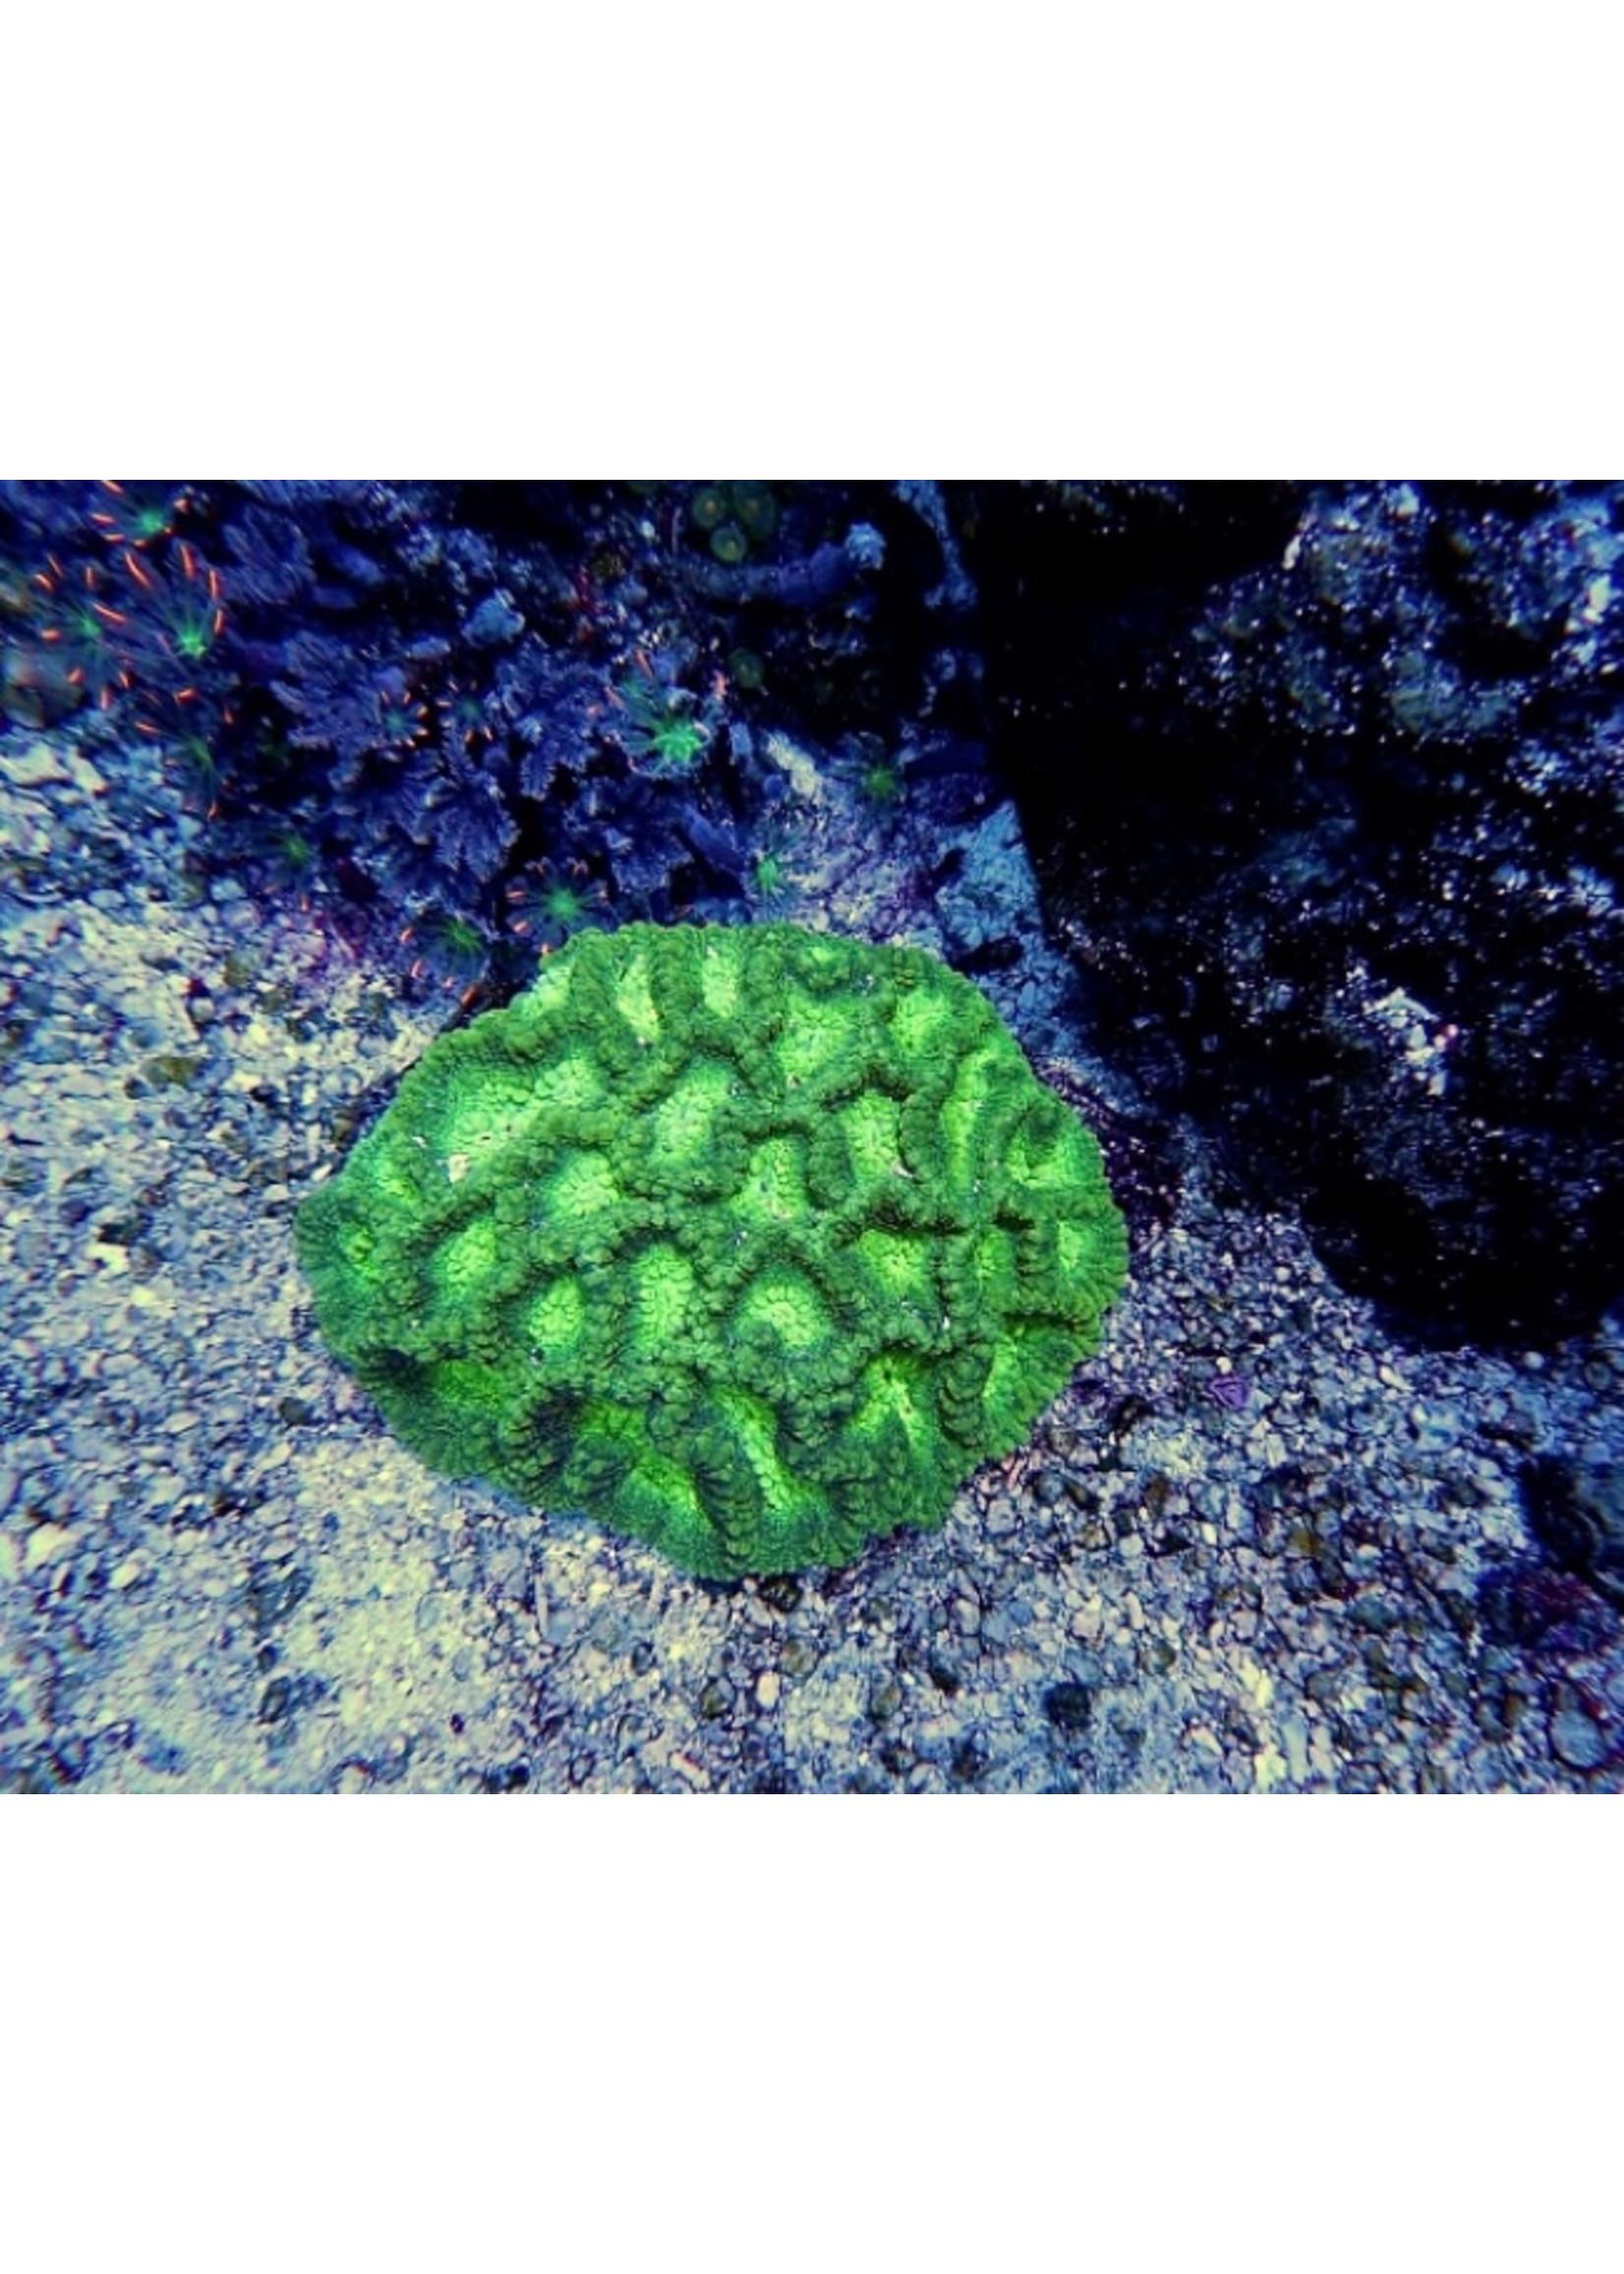 Acan Australian Acan Echinata Coral  WYSIWYG